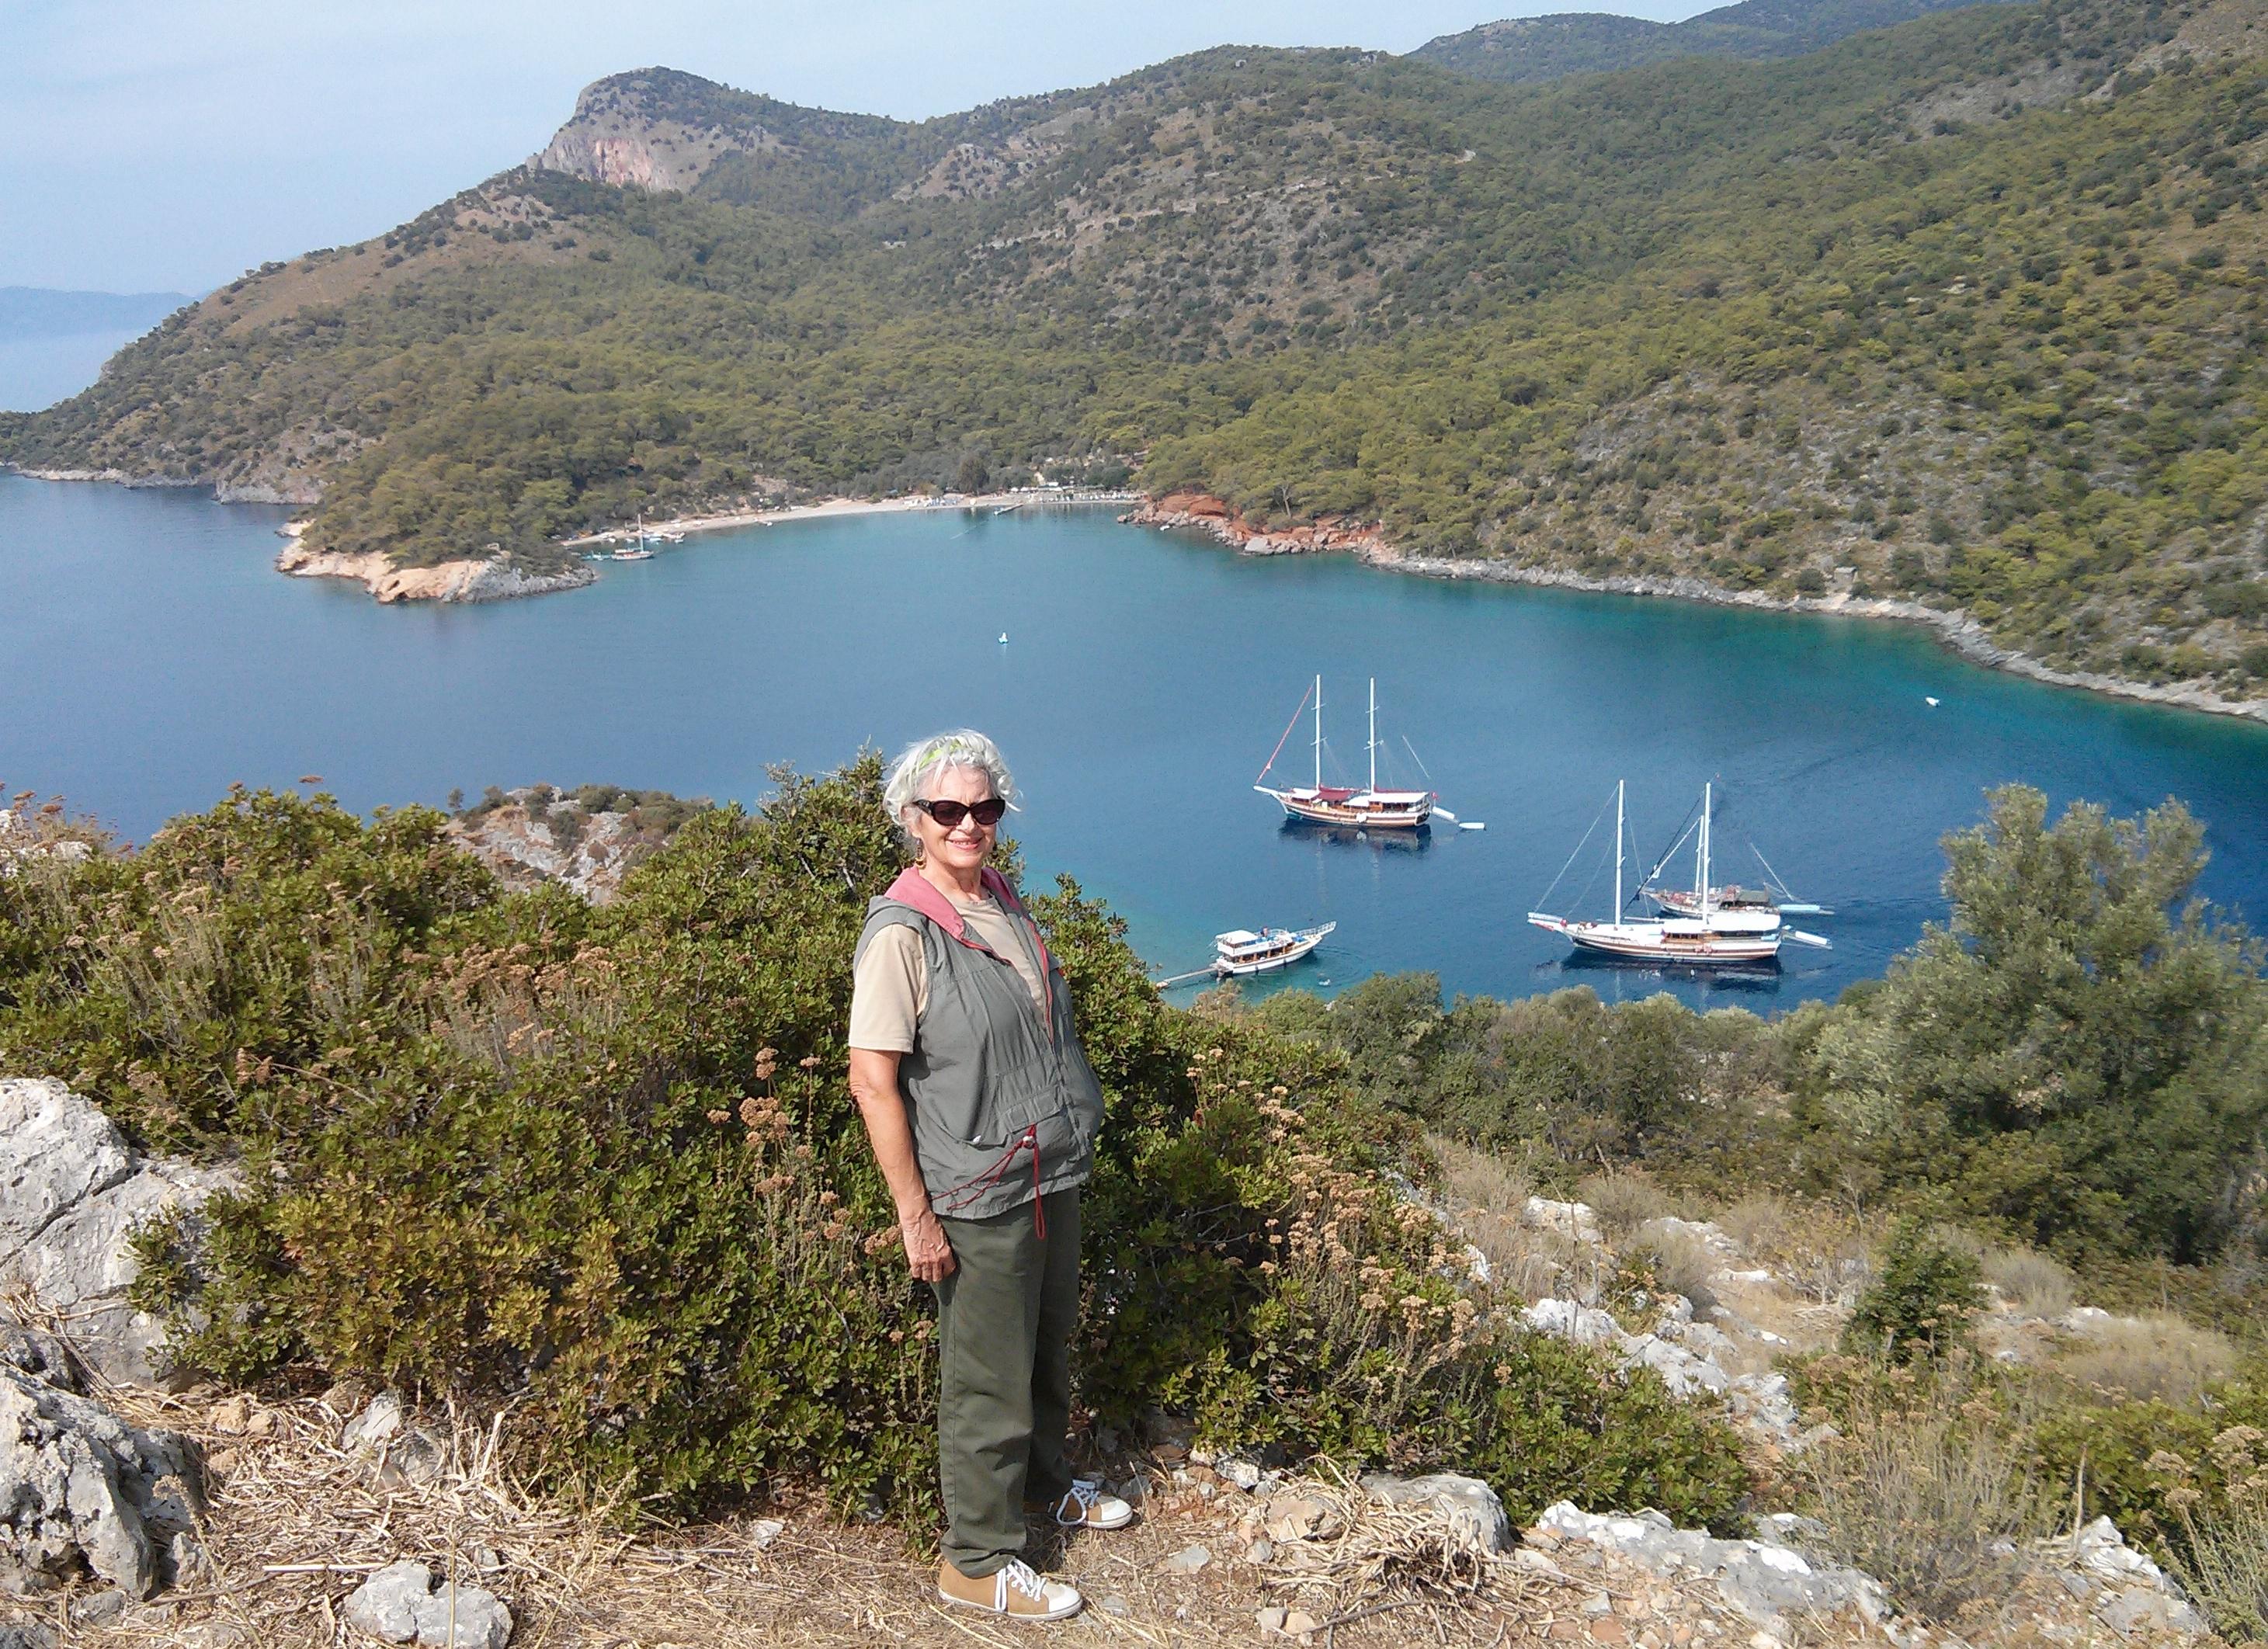 Bella Vivante and bay view at St. Nicholas island, Turkey